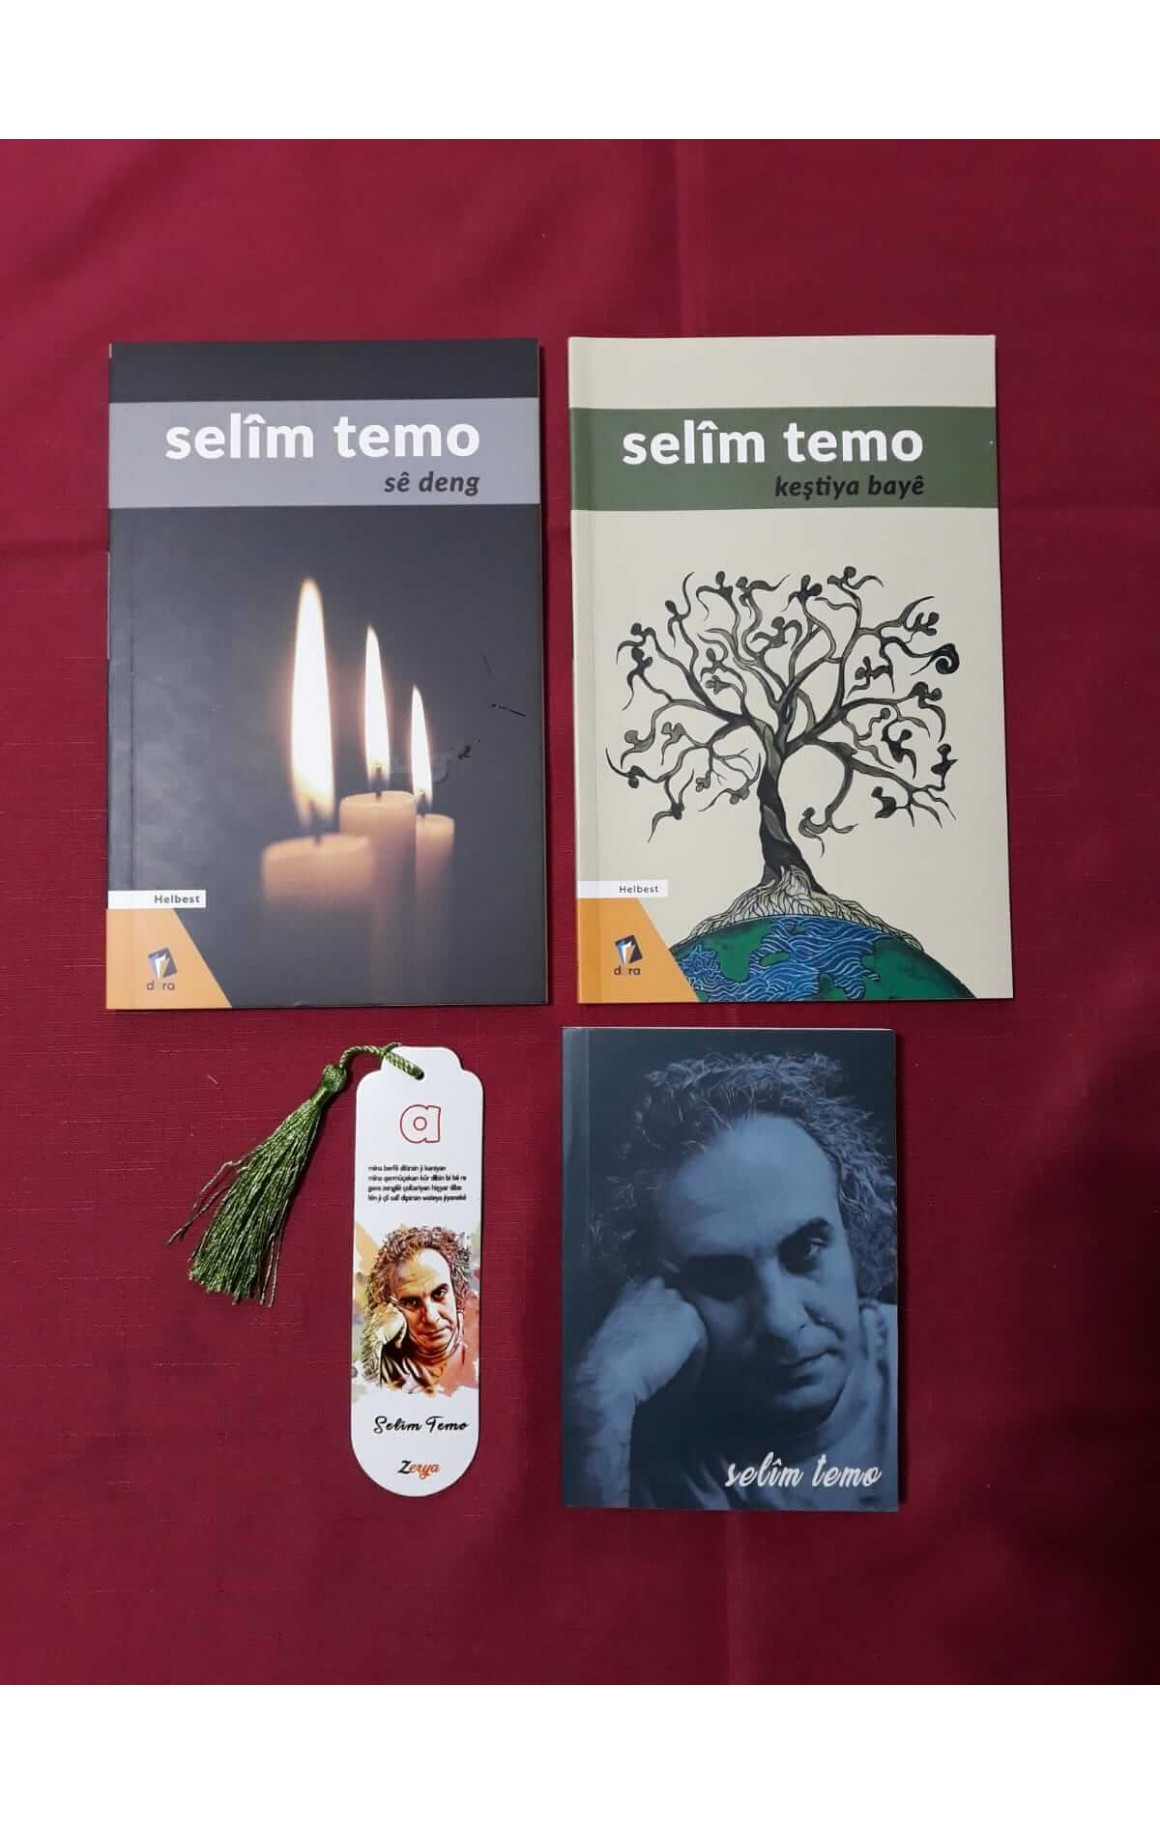 Selim Temo - Helbest (lênûsk + navbir)